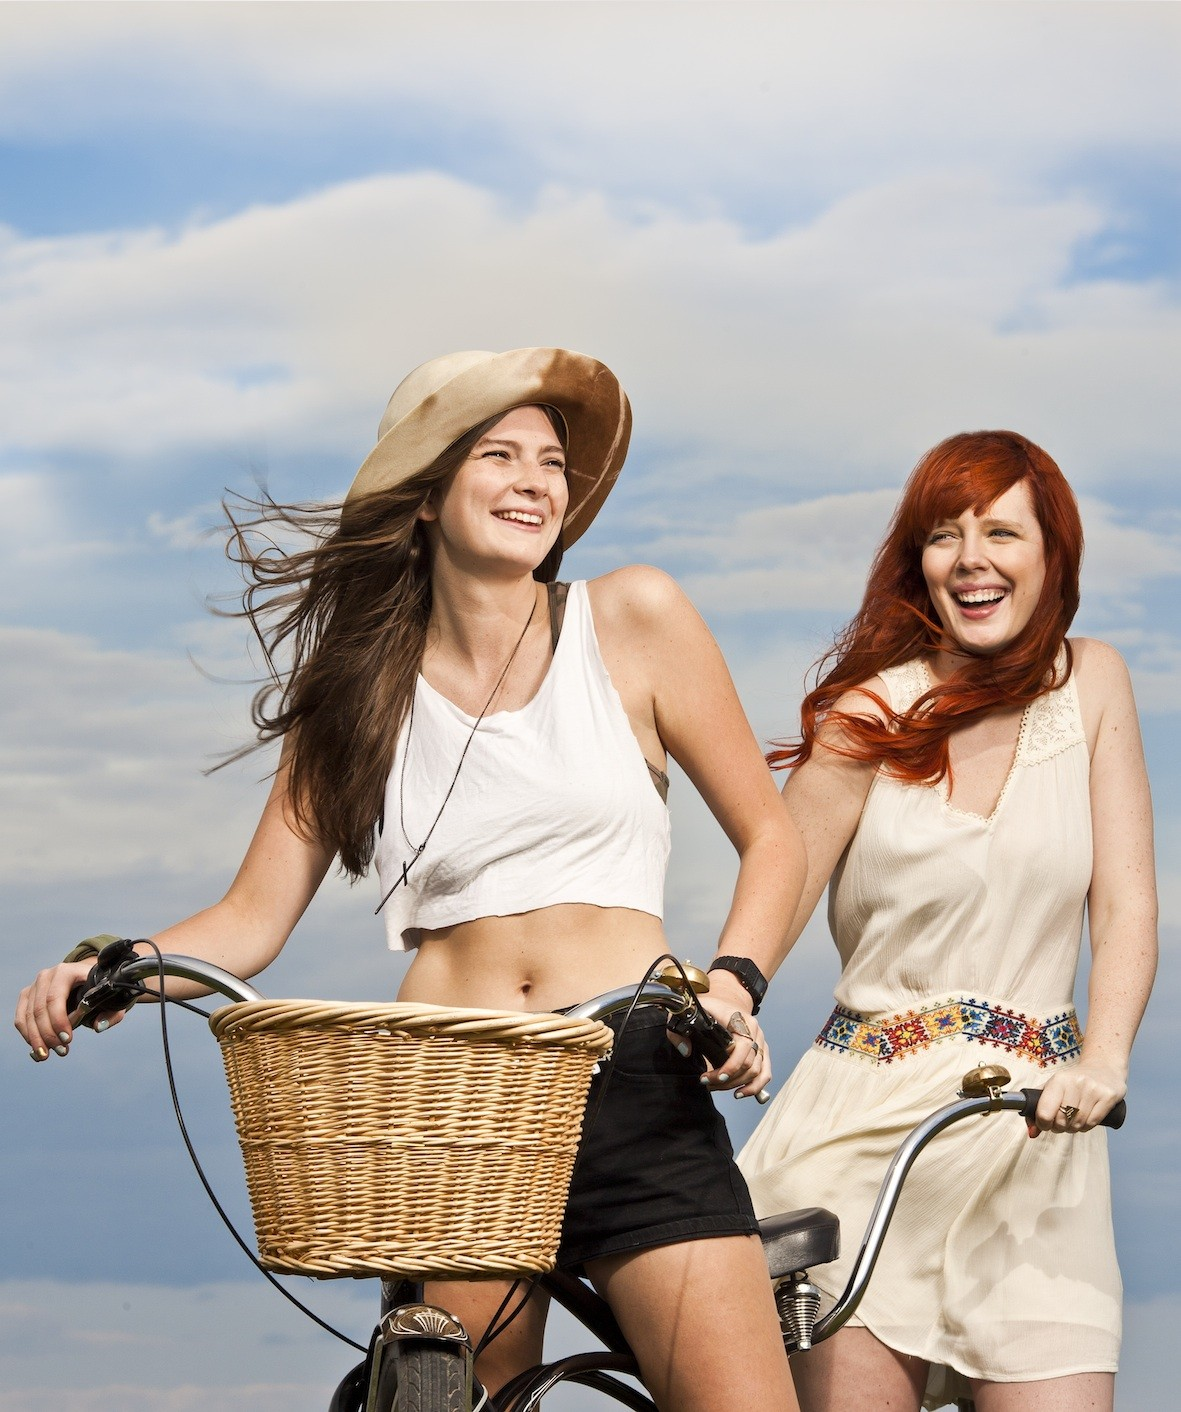 Bike buds - MEGHAN TANSEY WHITTON